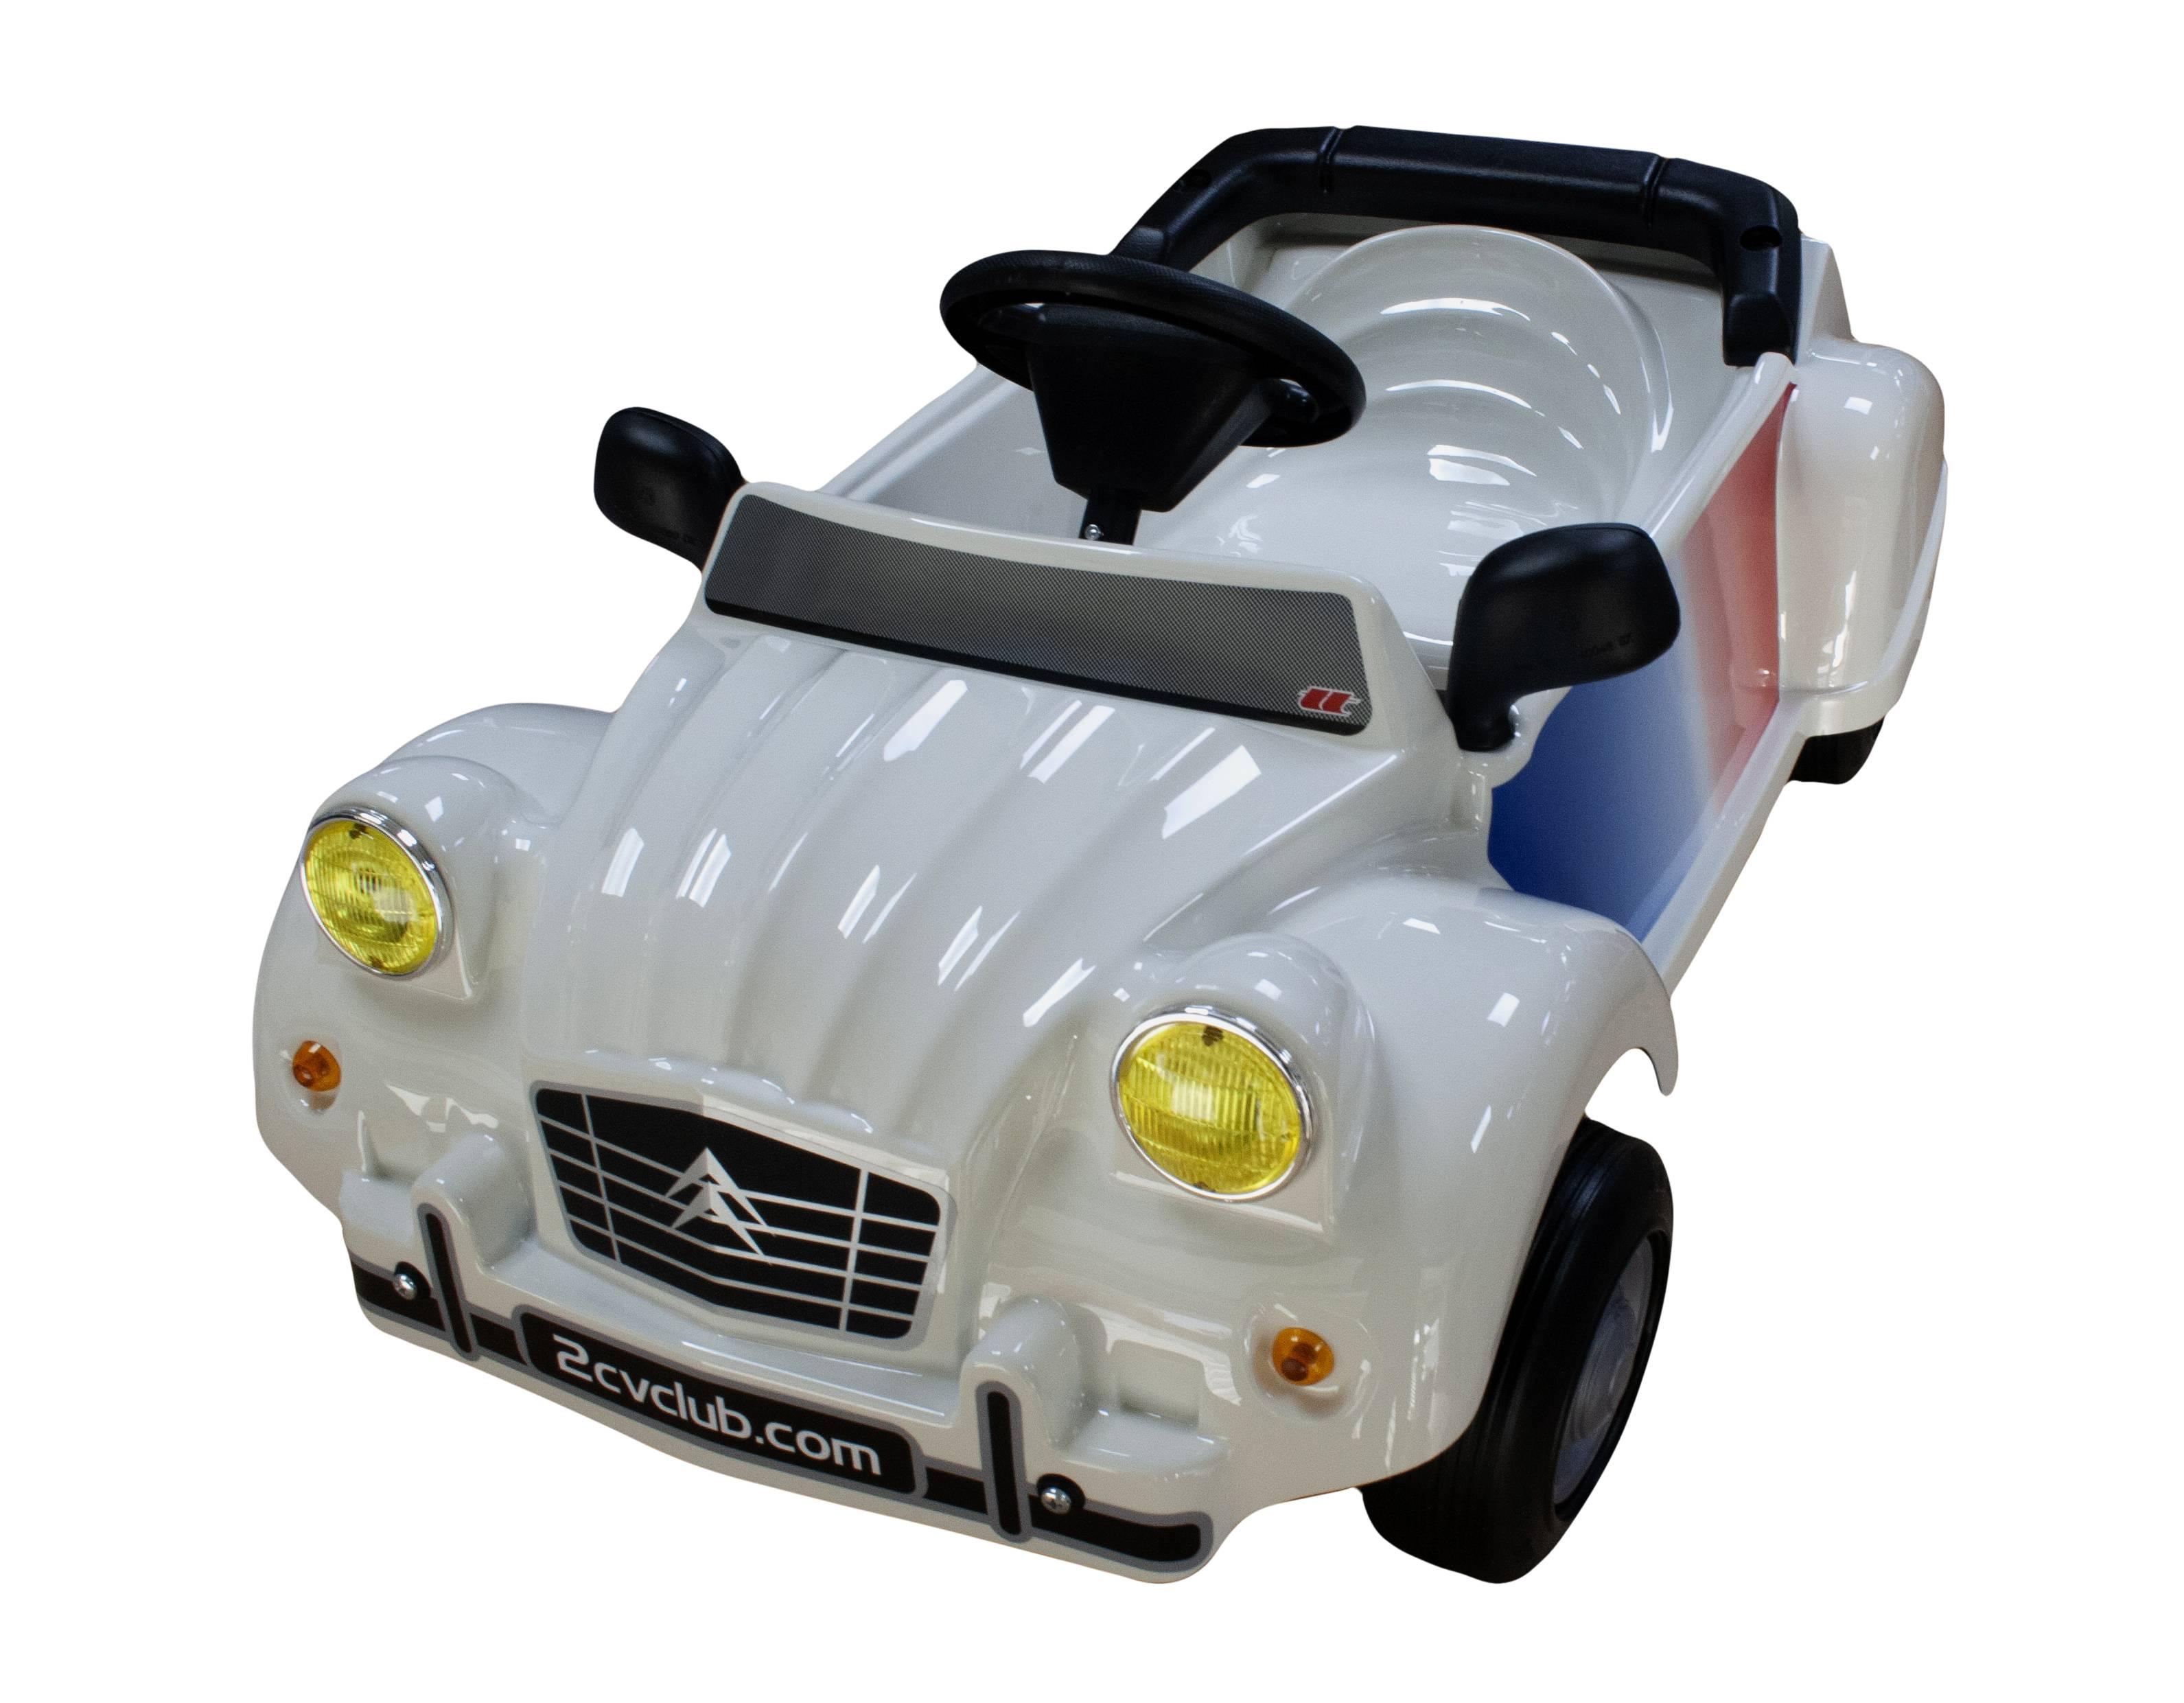 vente voiture a pedales 2cv cocorico